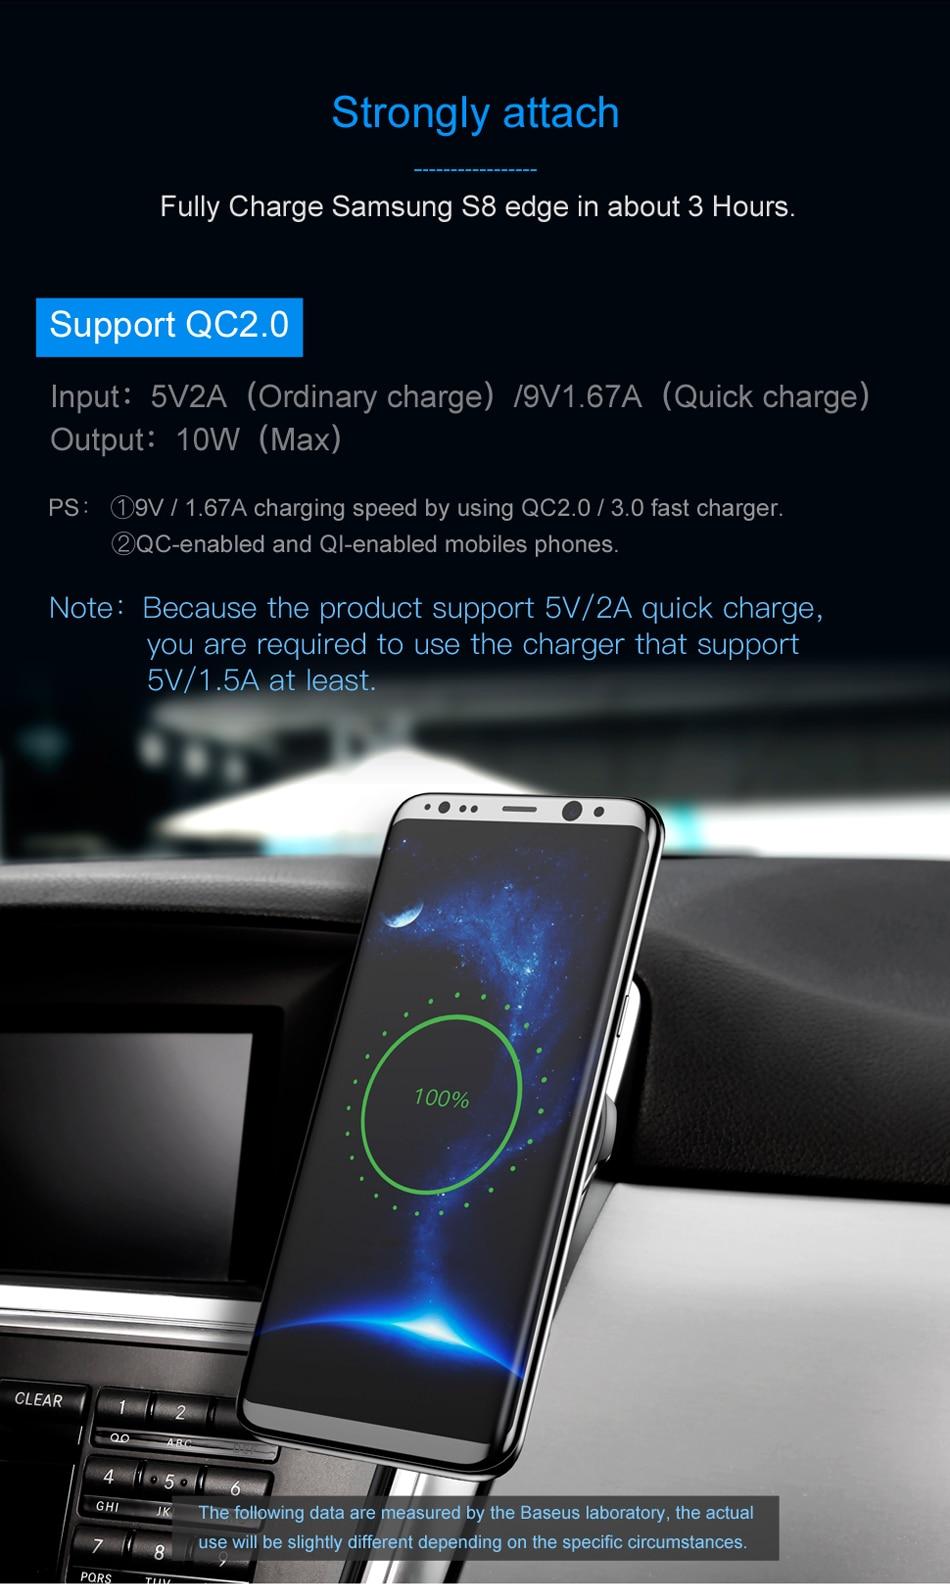 Baseus شاحن سيارة لاسلكي سريع من شركة iPhone X 8 Samsung Note 8 S8 S7 13